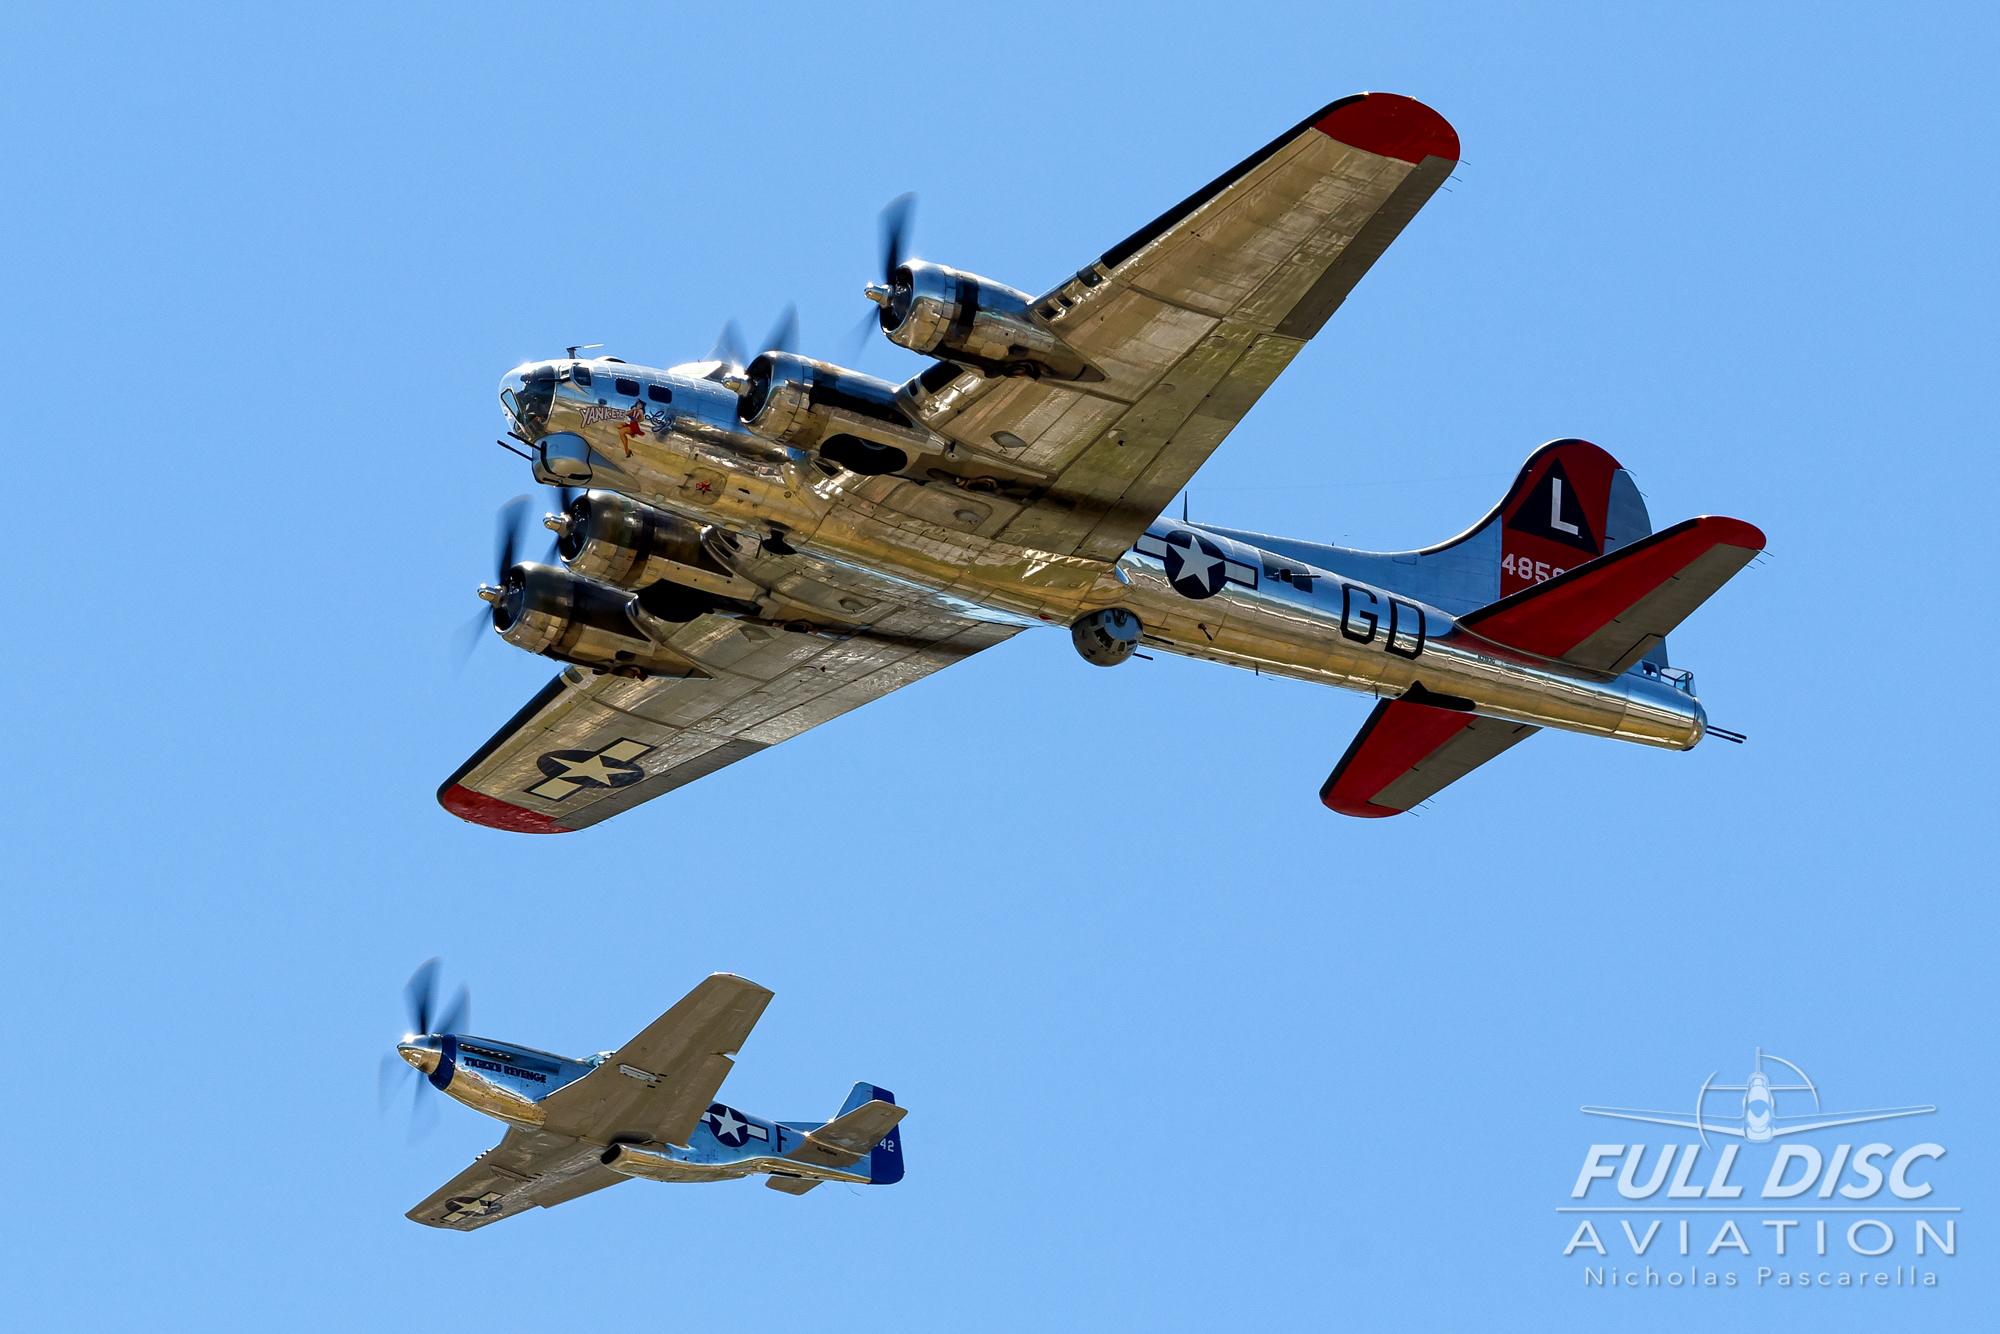 americanairpowermuseum_nicholaspascarella_nickpascarella_fulldiscaviation_legendsofairpower2019_aviation_warbird_b17_p51_escort_p51mustang_b17flyingfortress.jpg